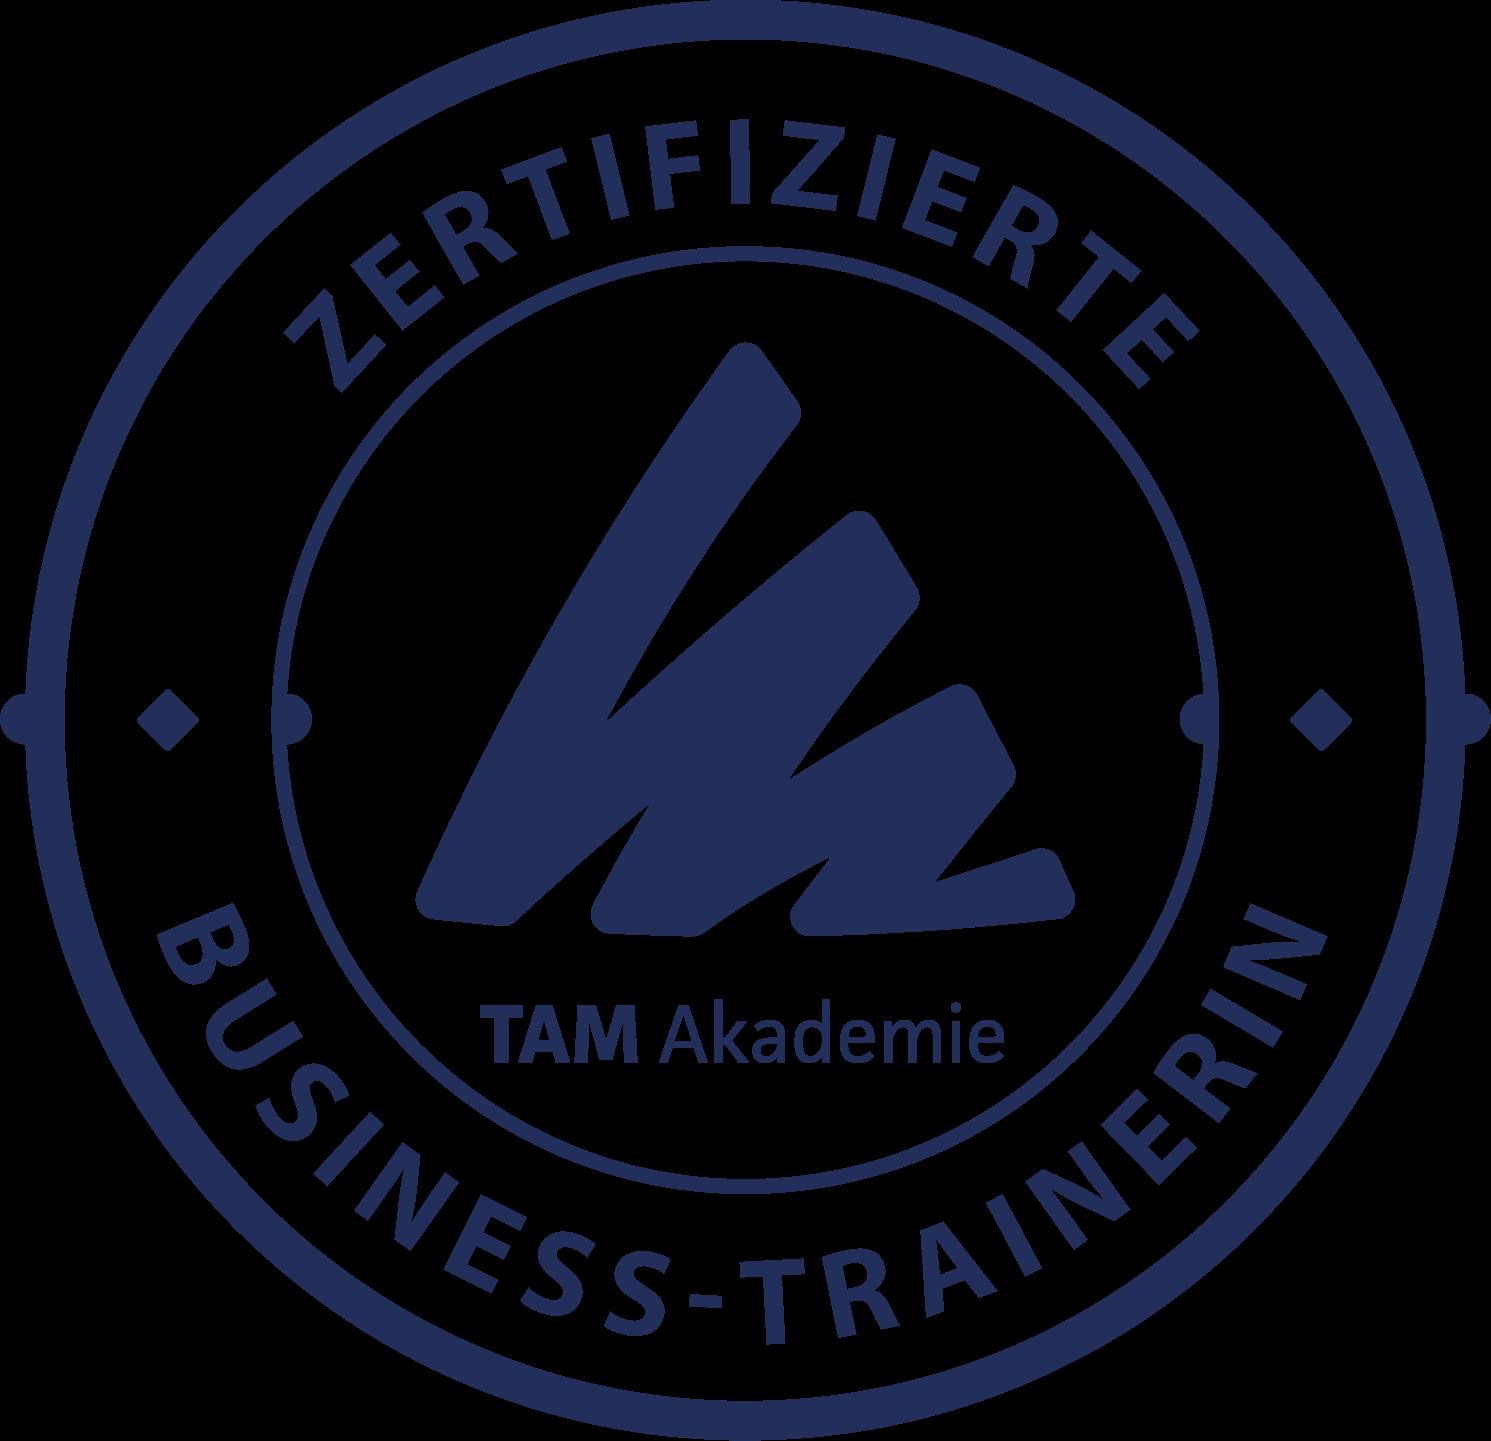 TAM zertifizierte Business-Trainerin